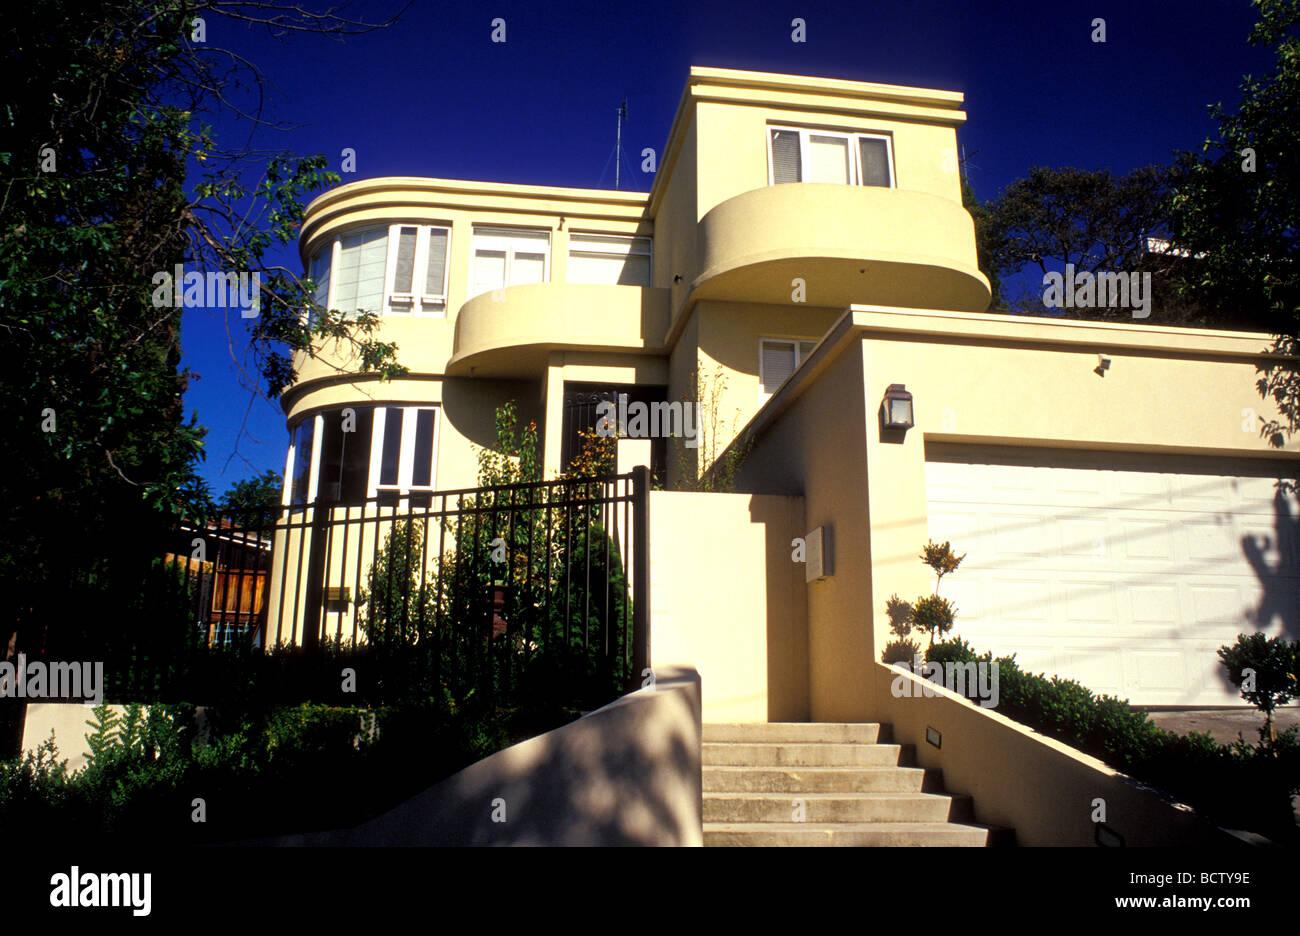 art deco style houses australia - house style